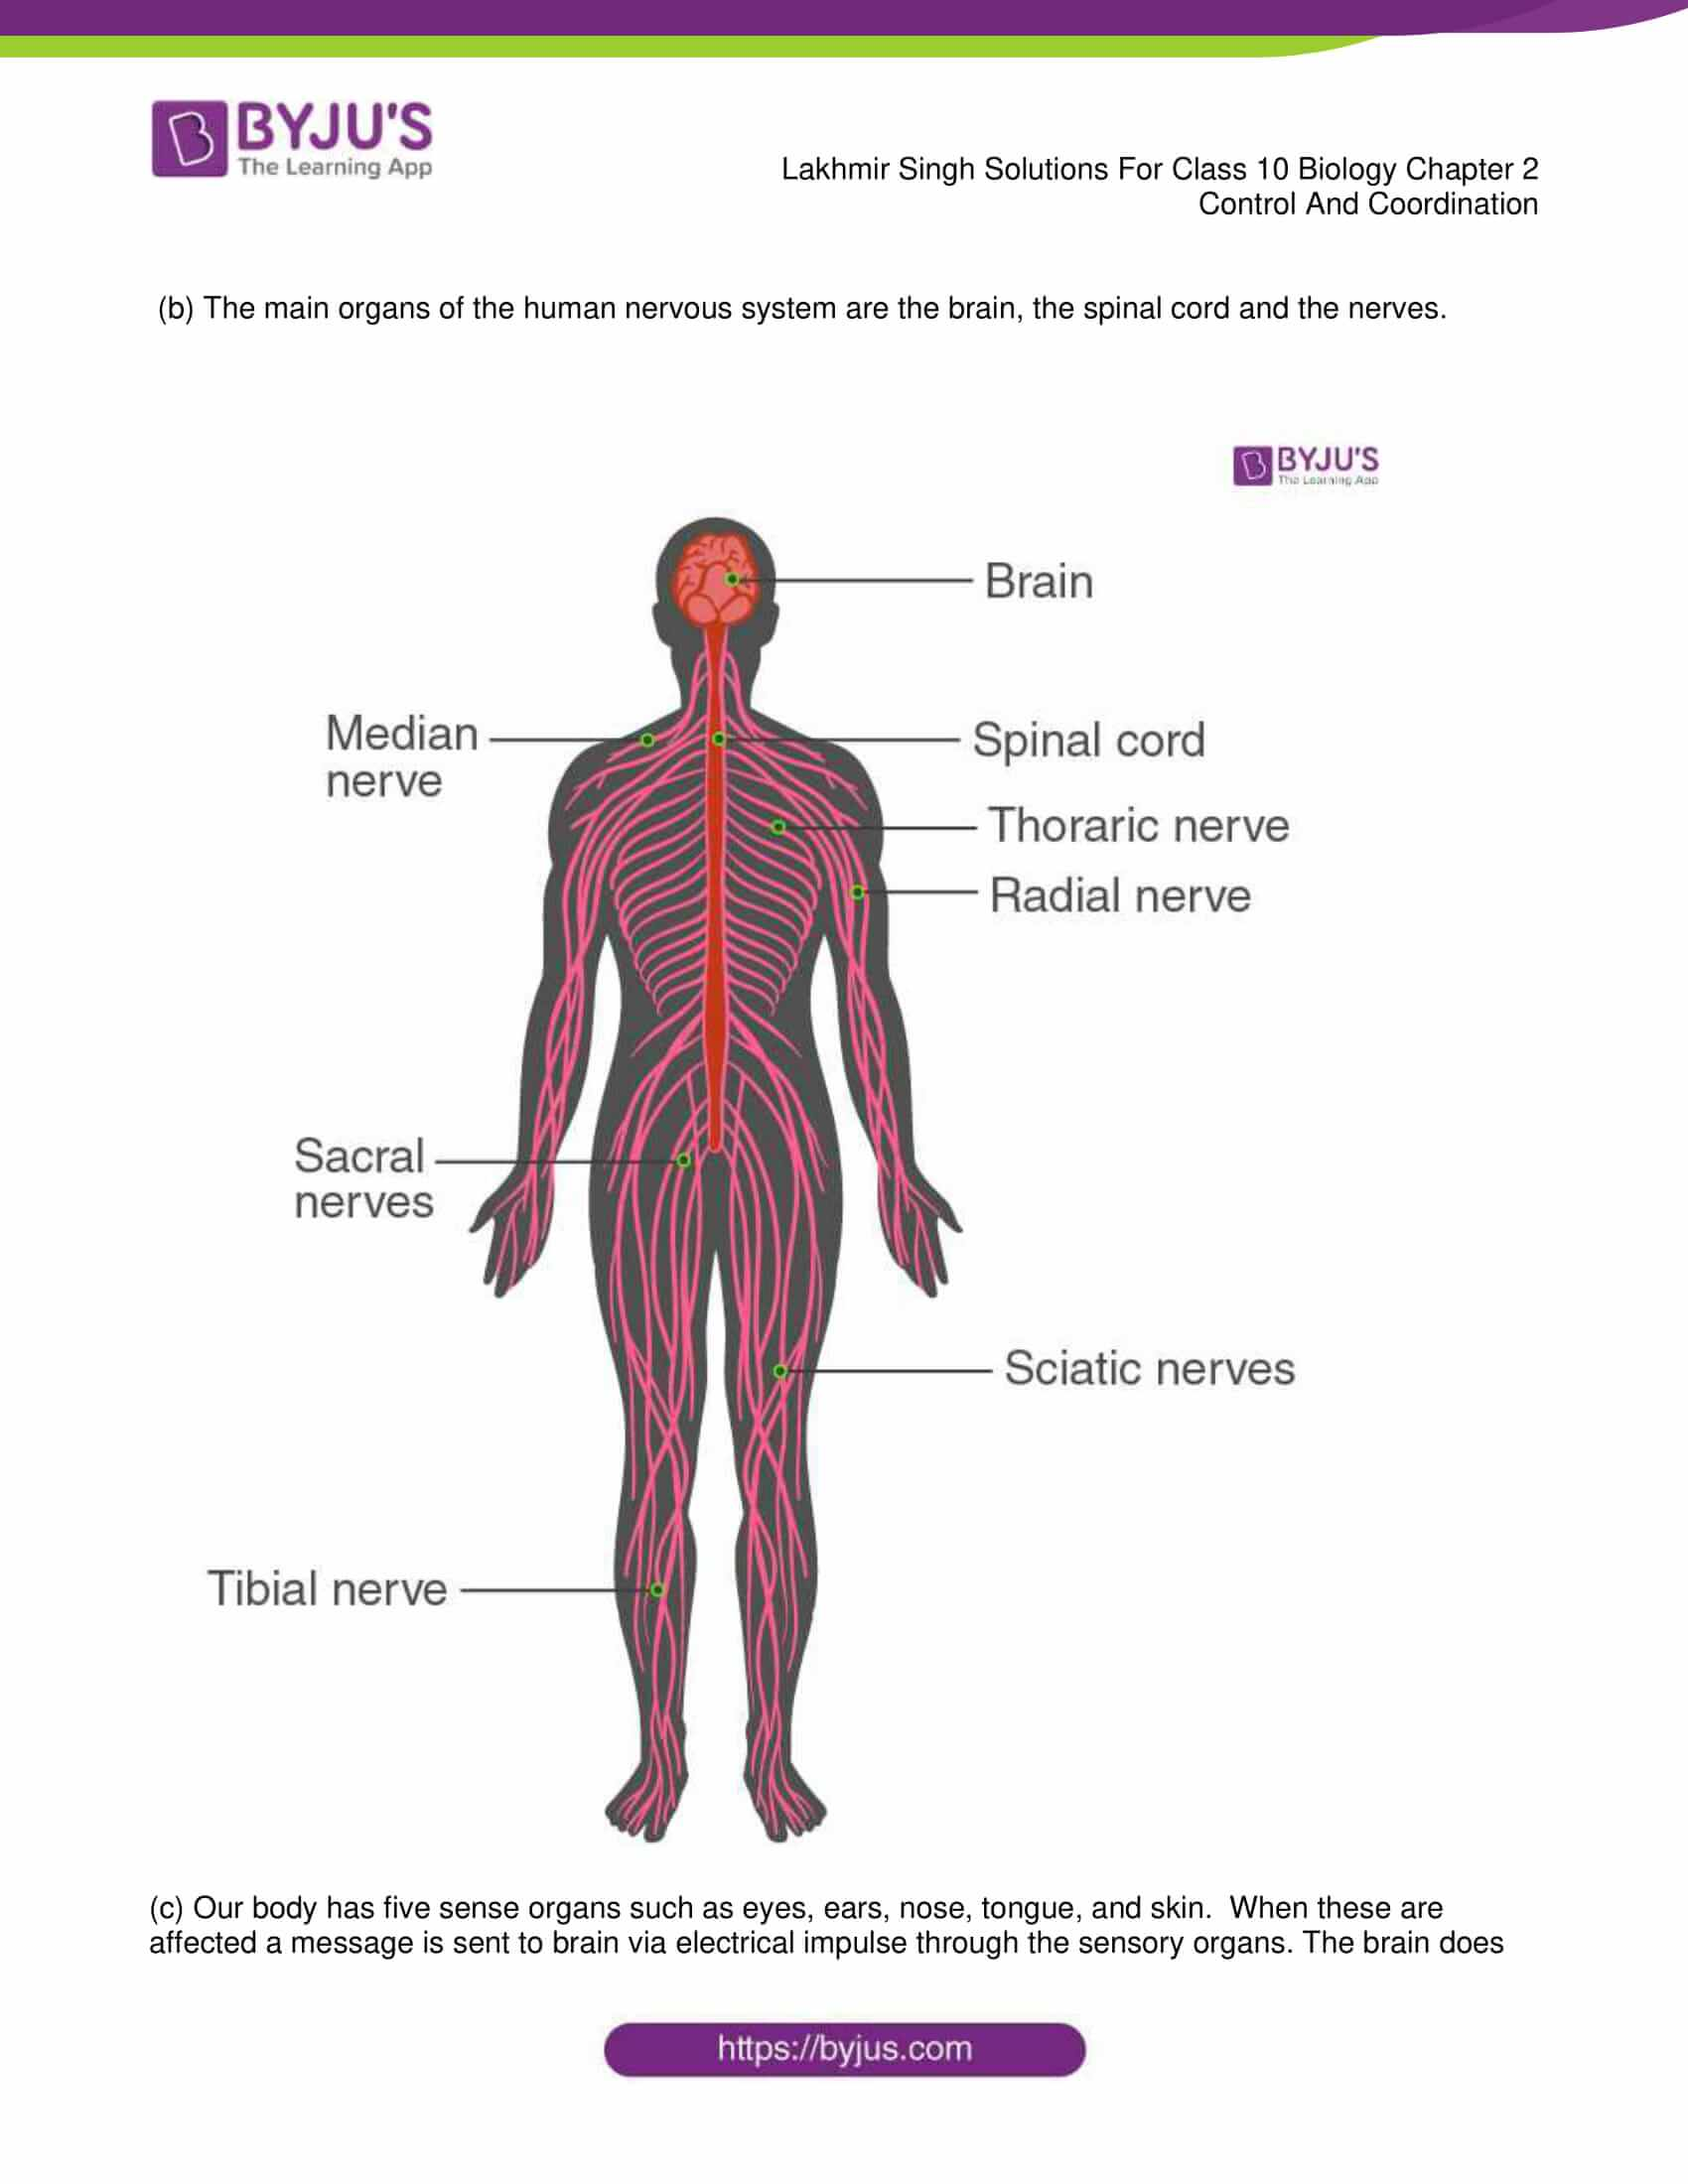 lakhmir singh sol class 10 biology chapter 2 38